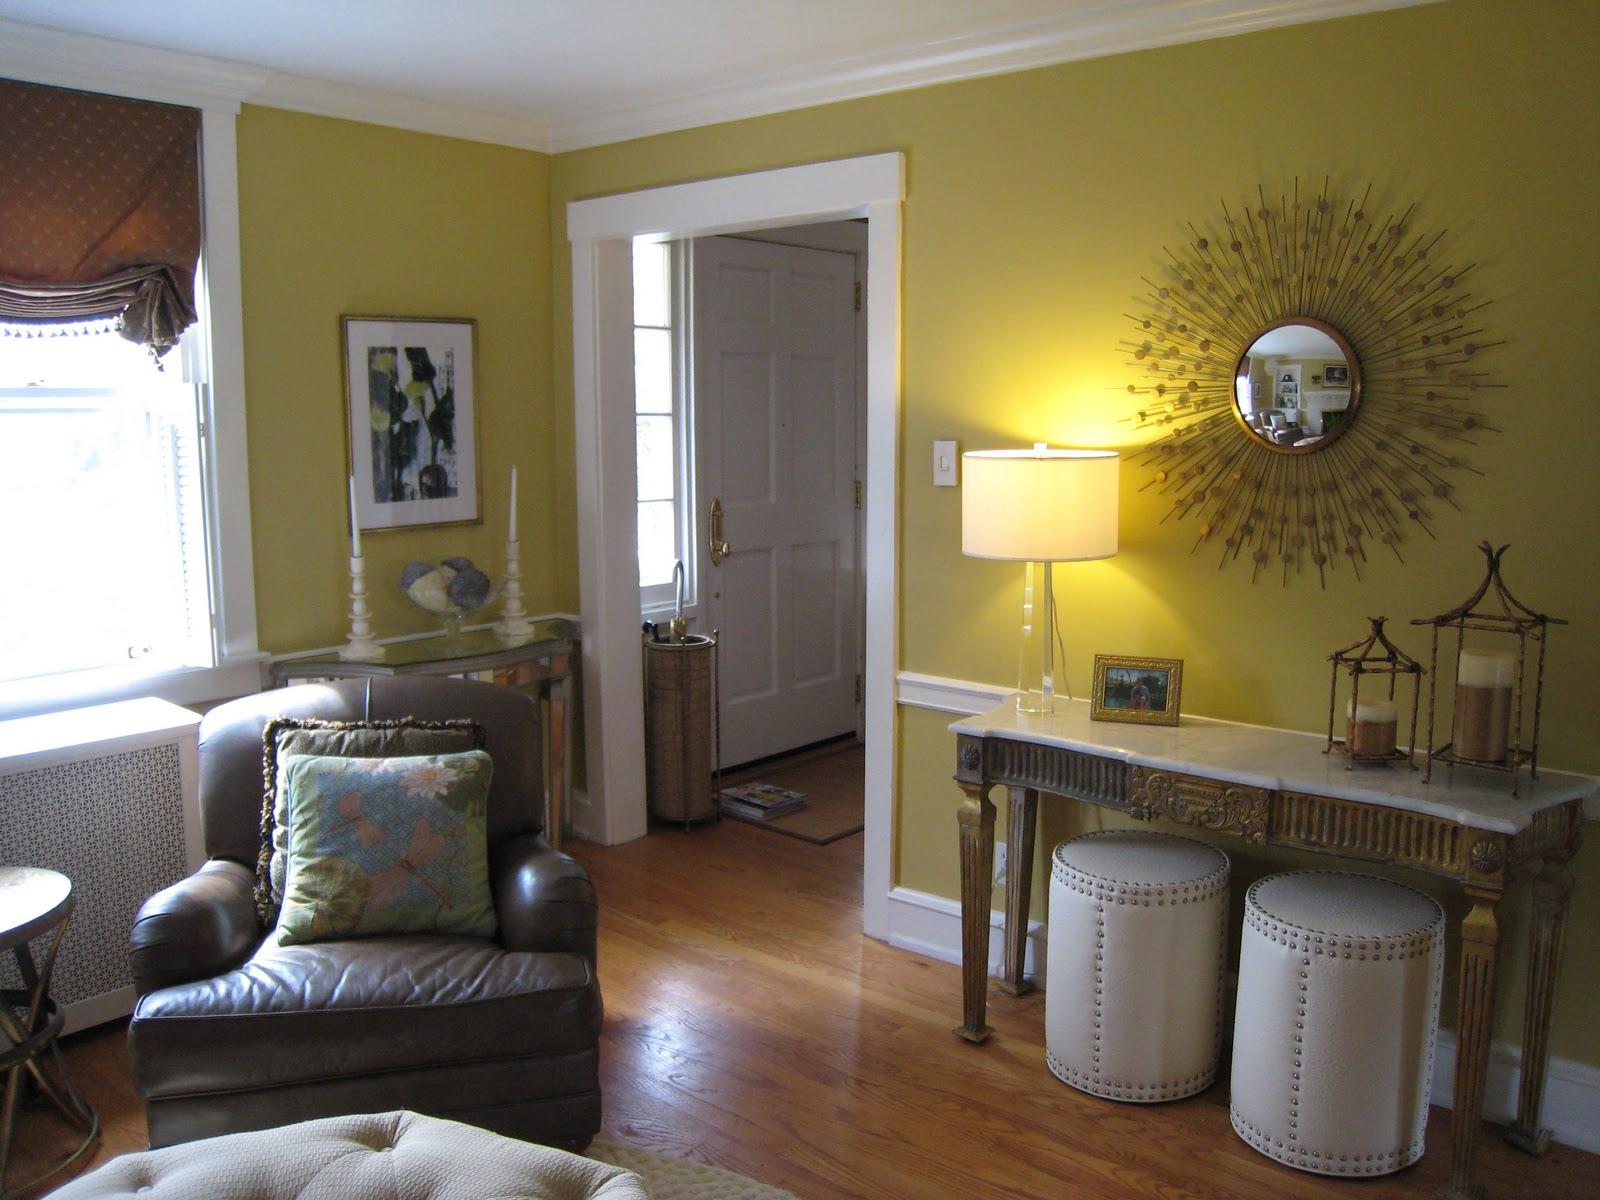 Living room design chocolate brown living room interior for Chocolate brown living room ideas